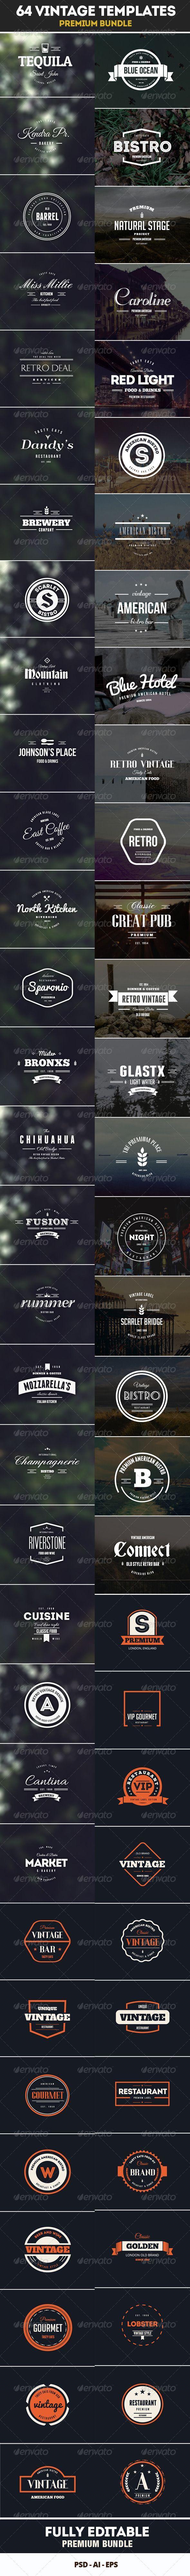 64 Vintage Labels & Badges Logos Bundle Template   Buy and Download: http://graphicriver.net/item/64-vintage-labels-badges-logos-bundle/7993973?WT.ac=category_thumb&WT.z_author=designdistrictmx&ref=ksioks: